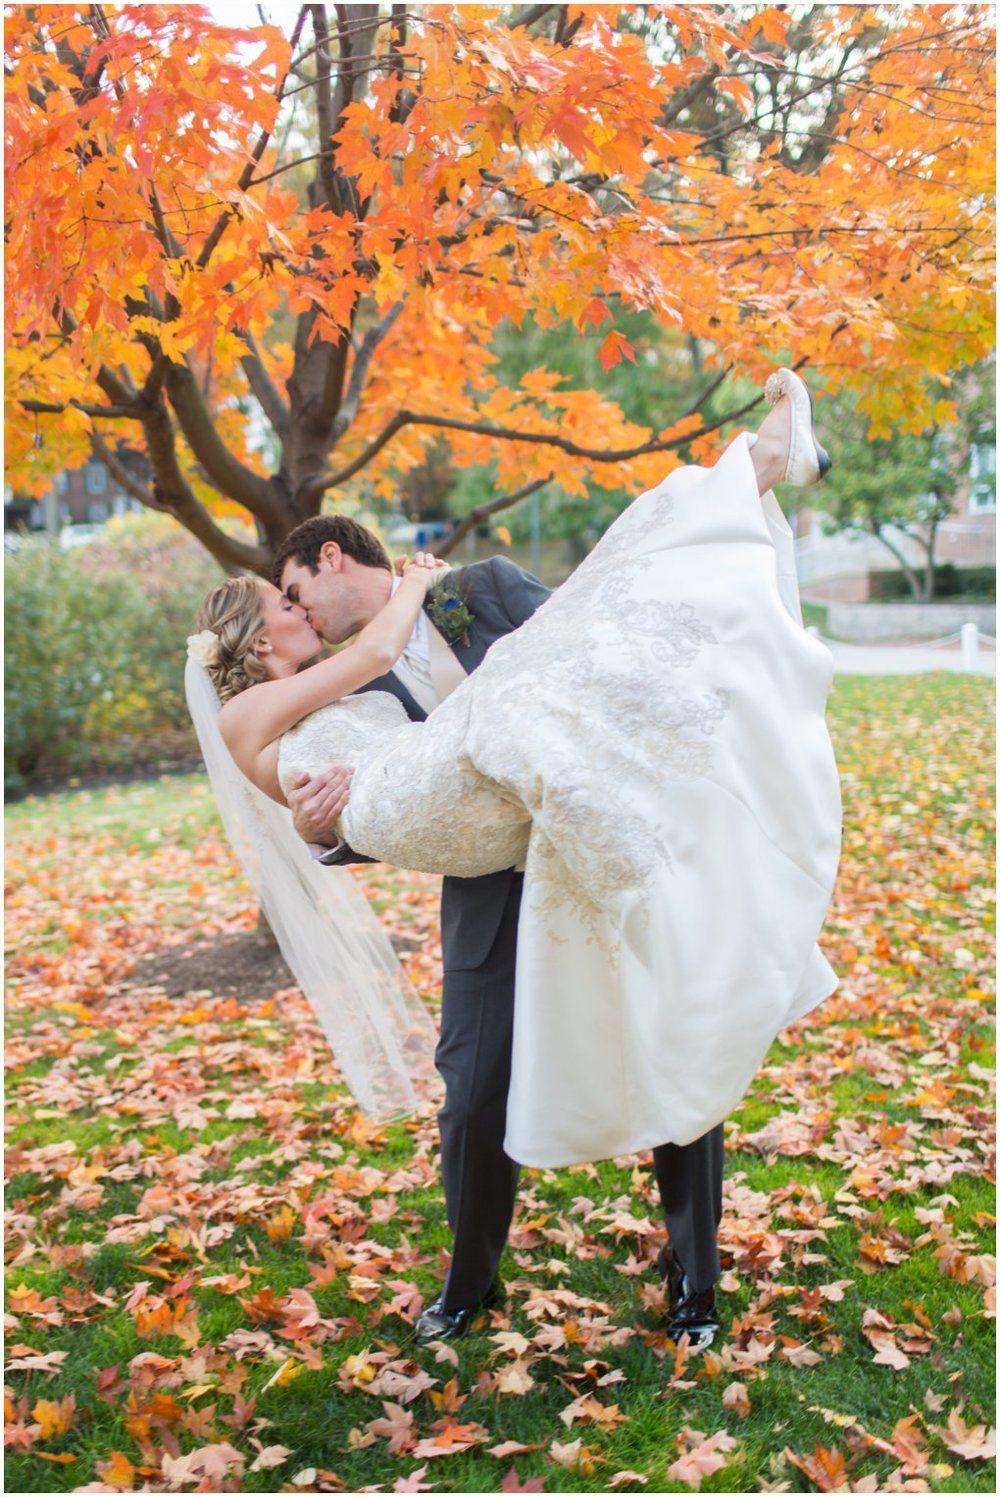 Anna Grace Photography - Baltimore Wedding Photography